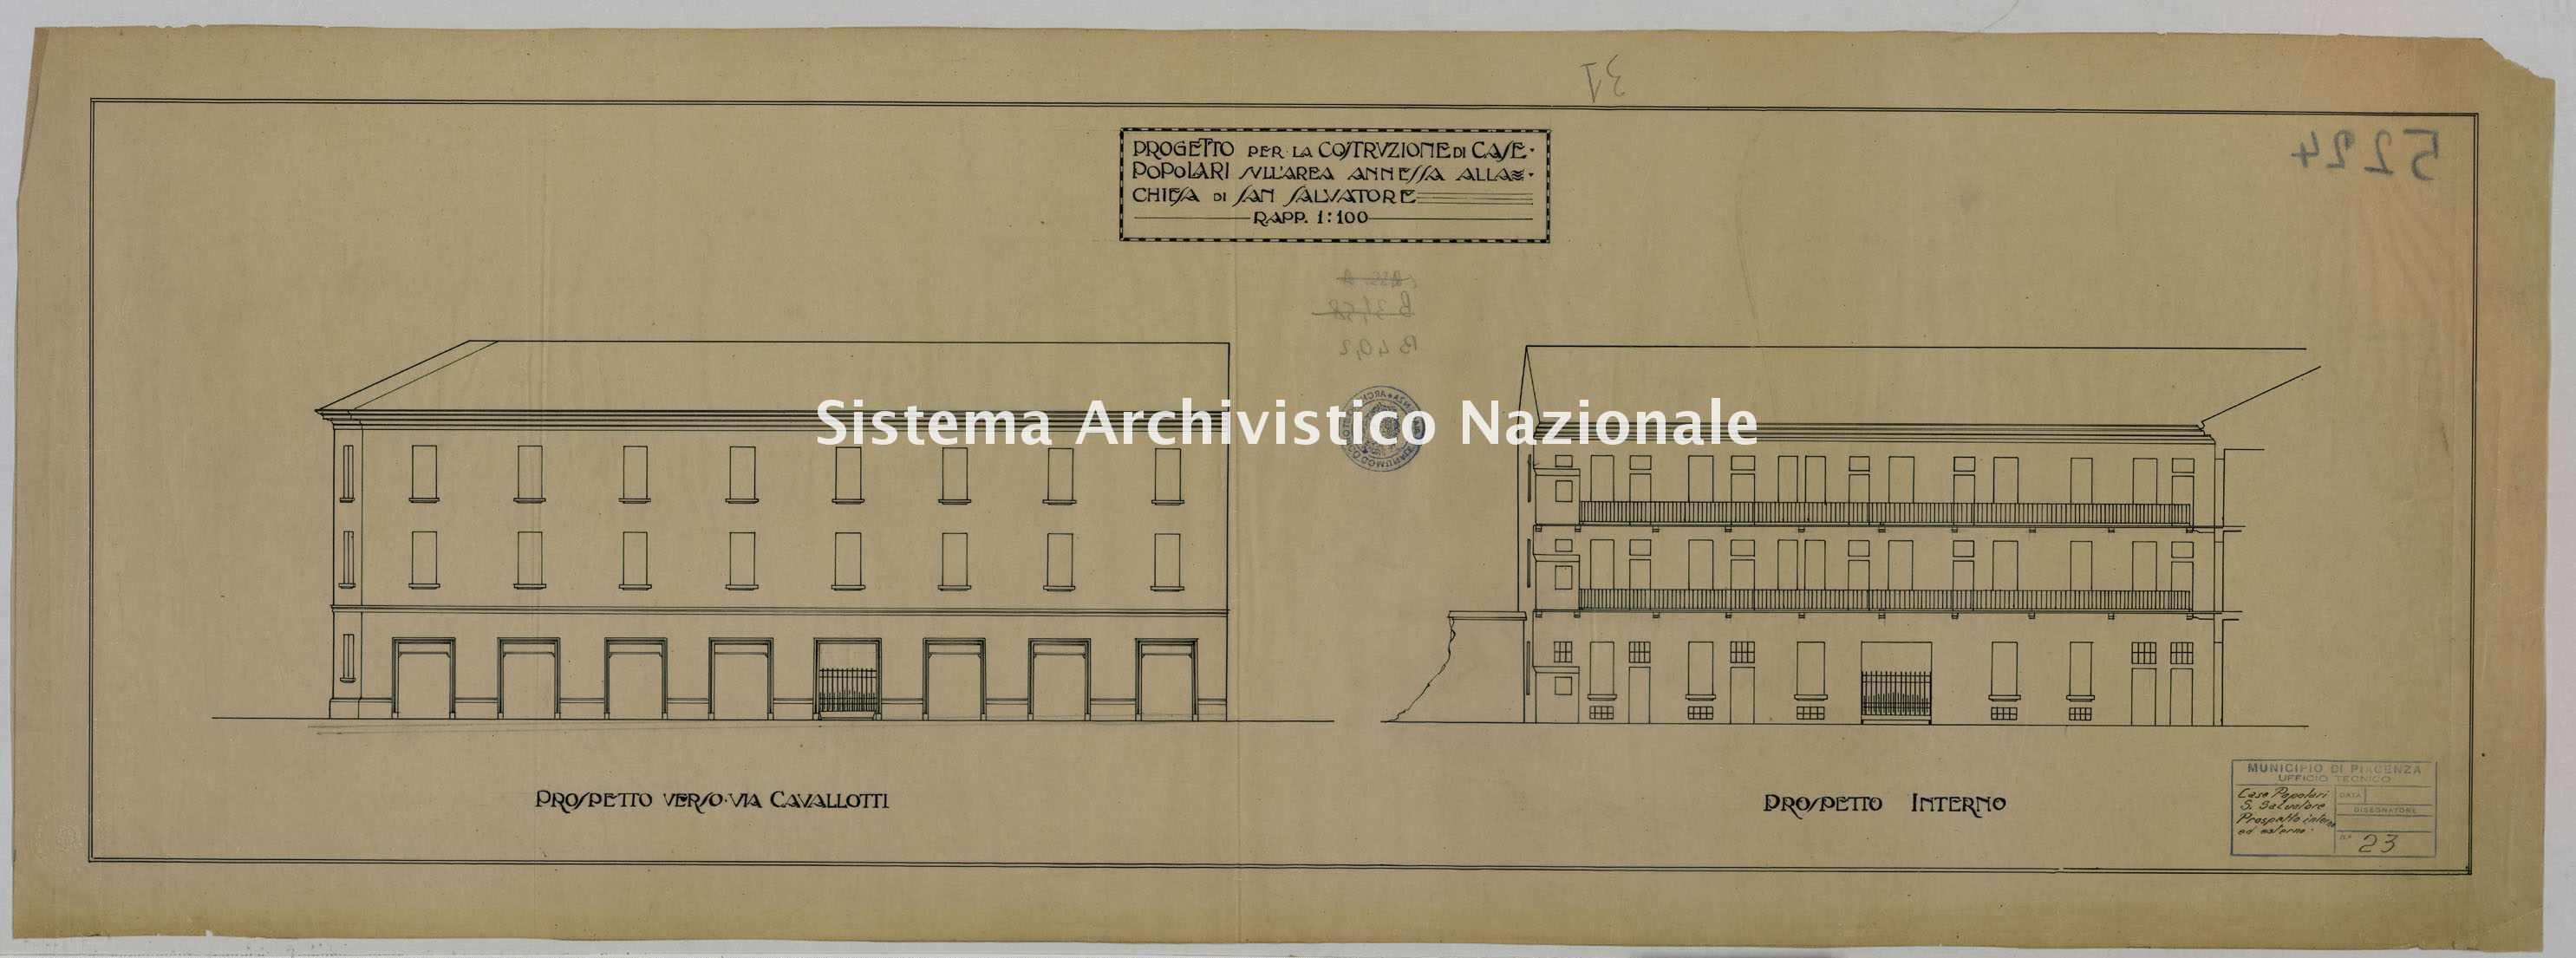 ASPC Mappe, stampe e disegni, n. 5224